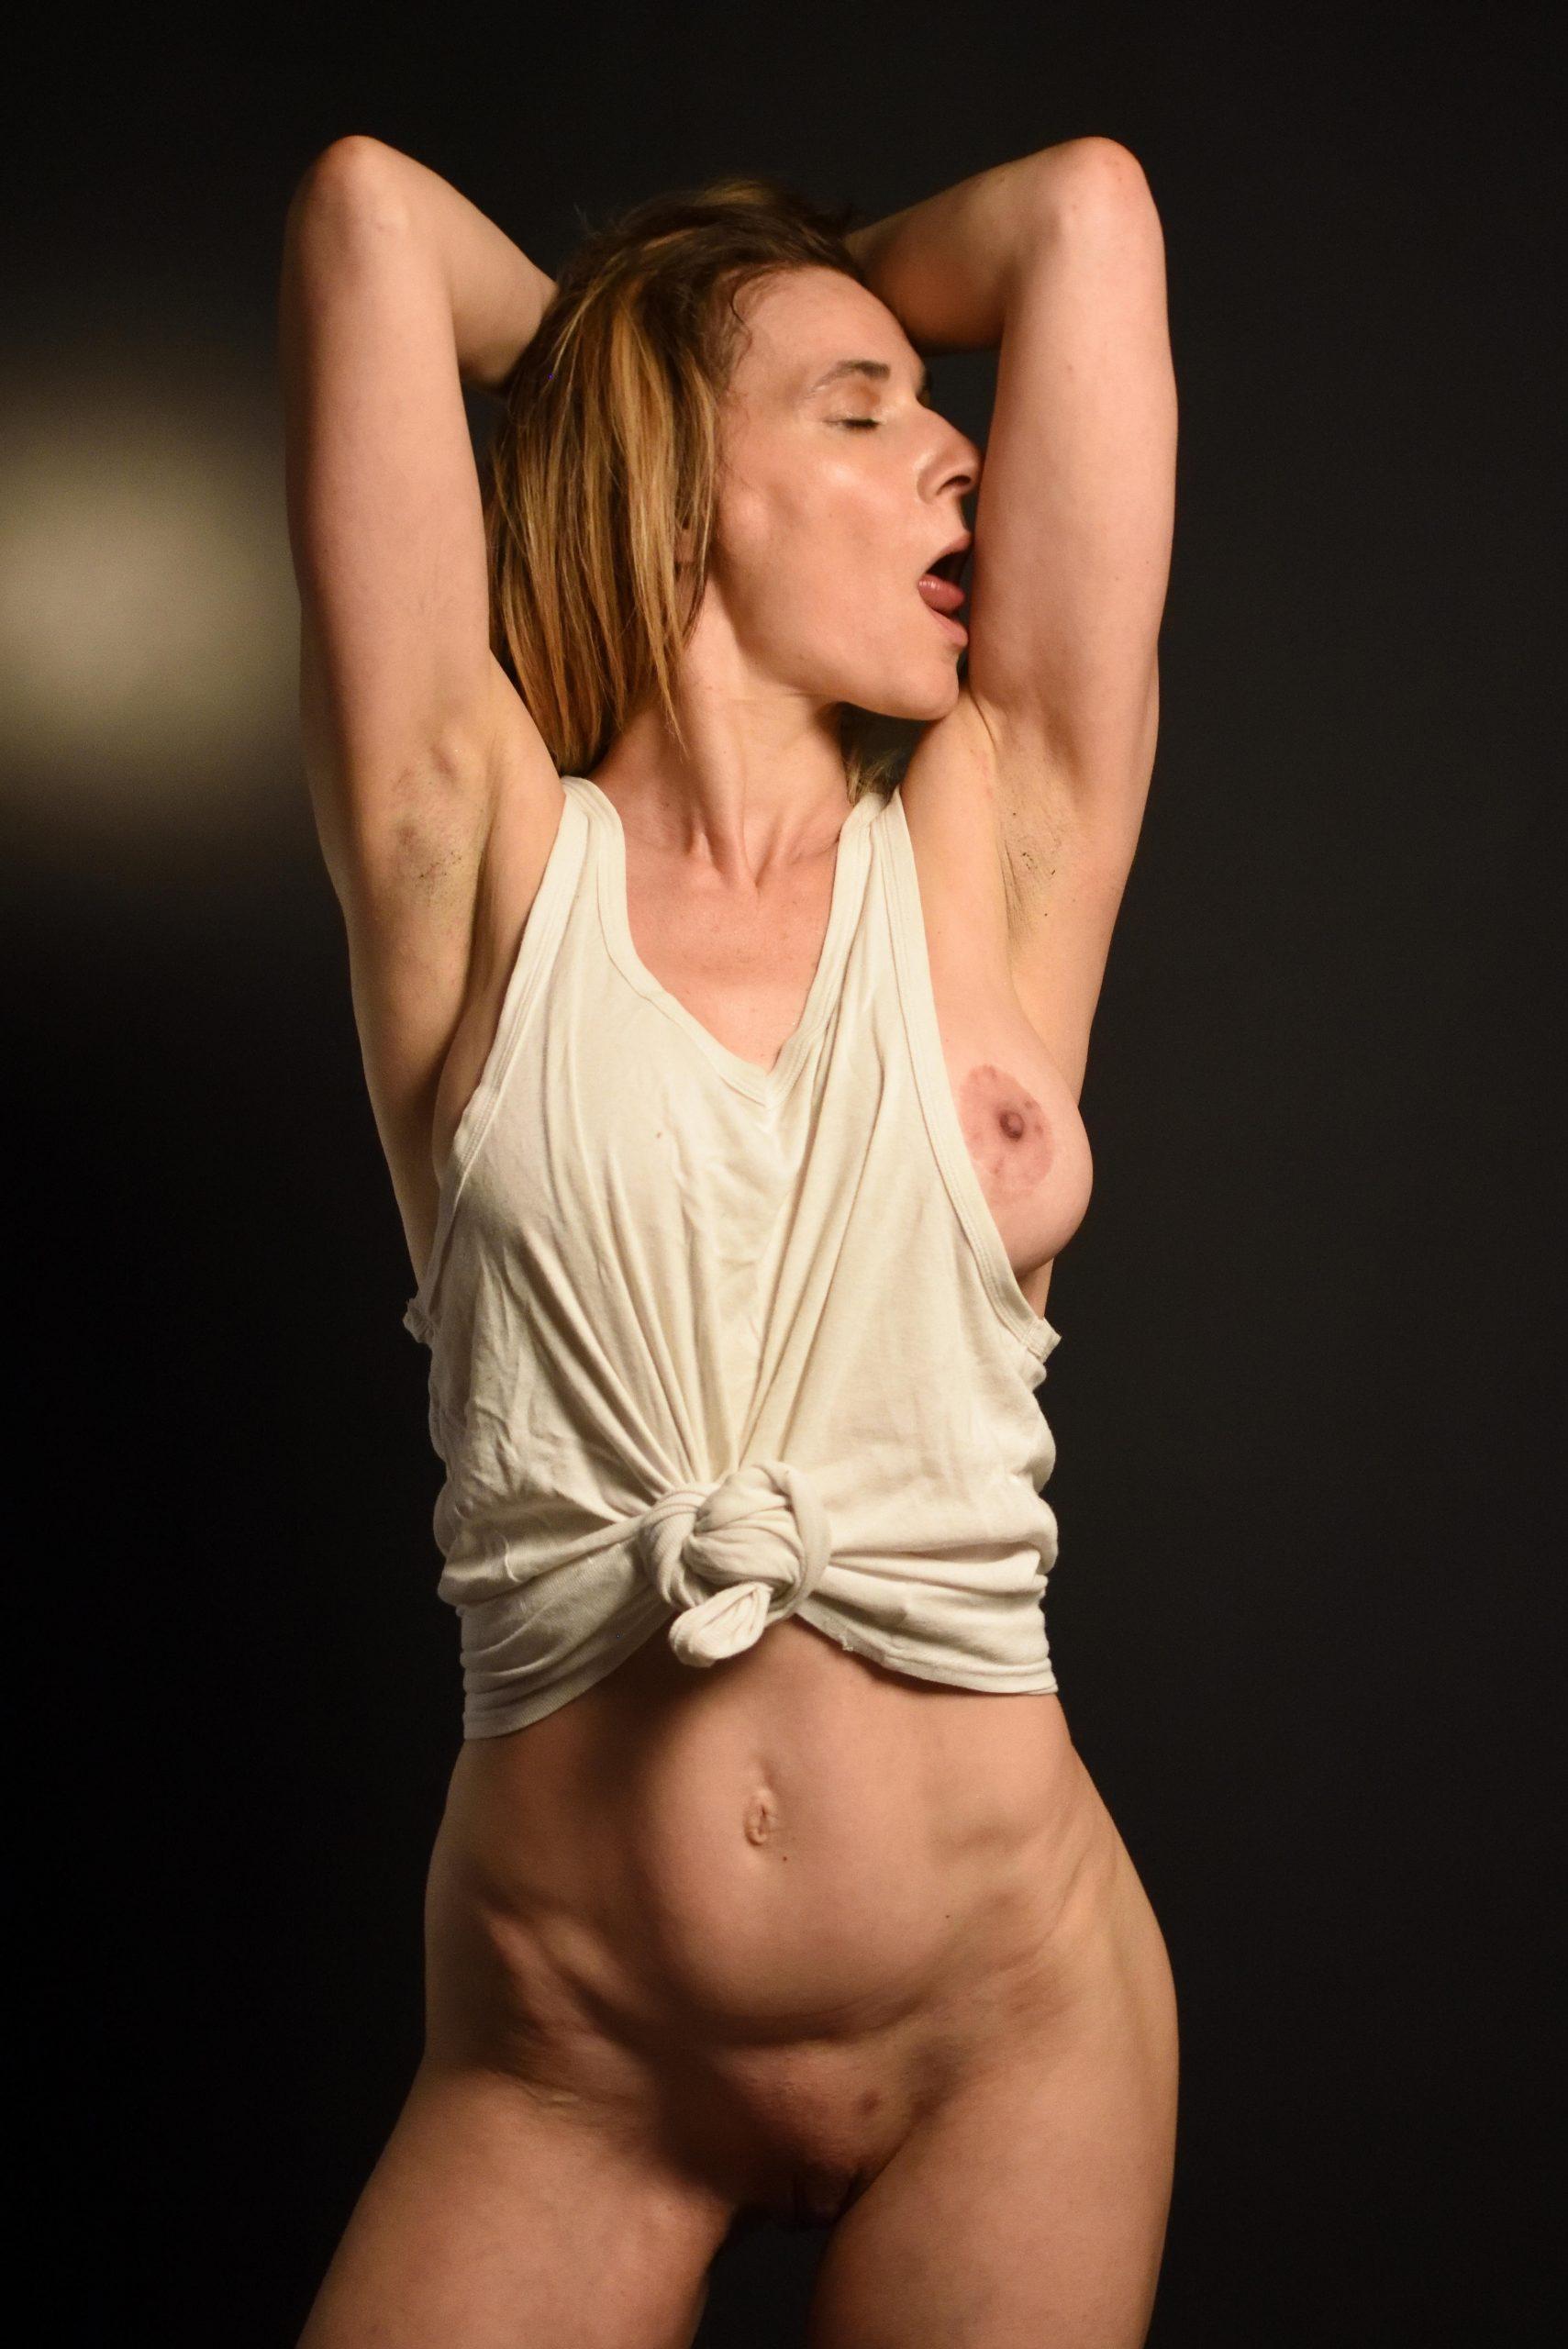 mature woman naked